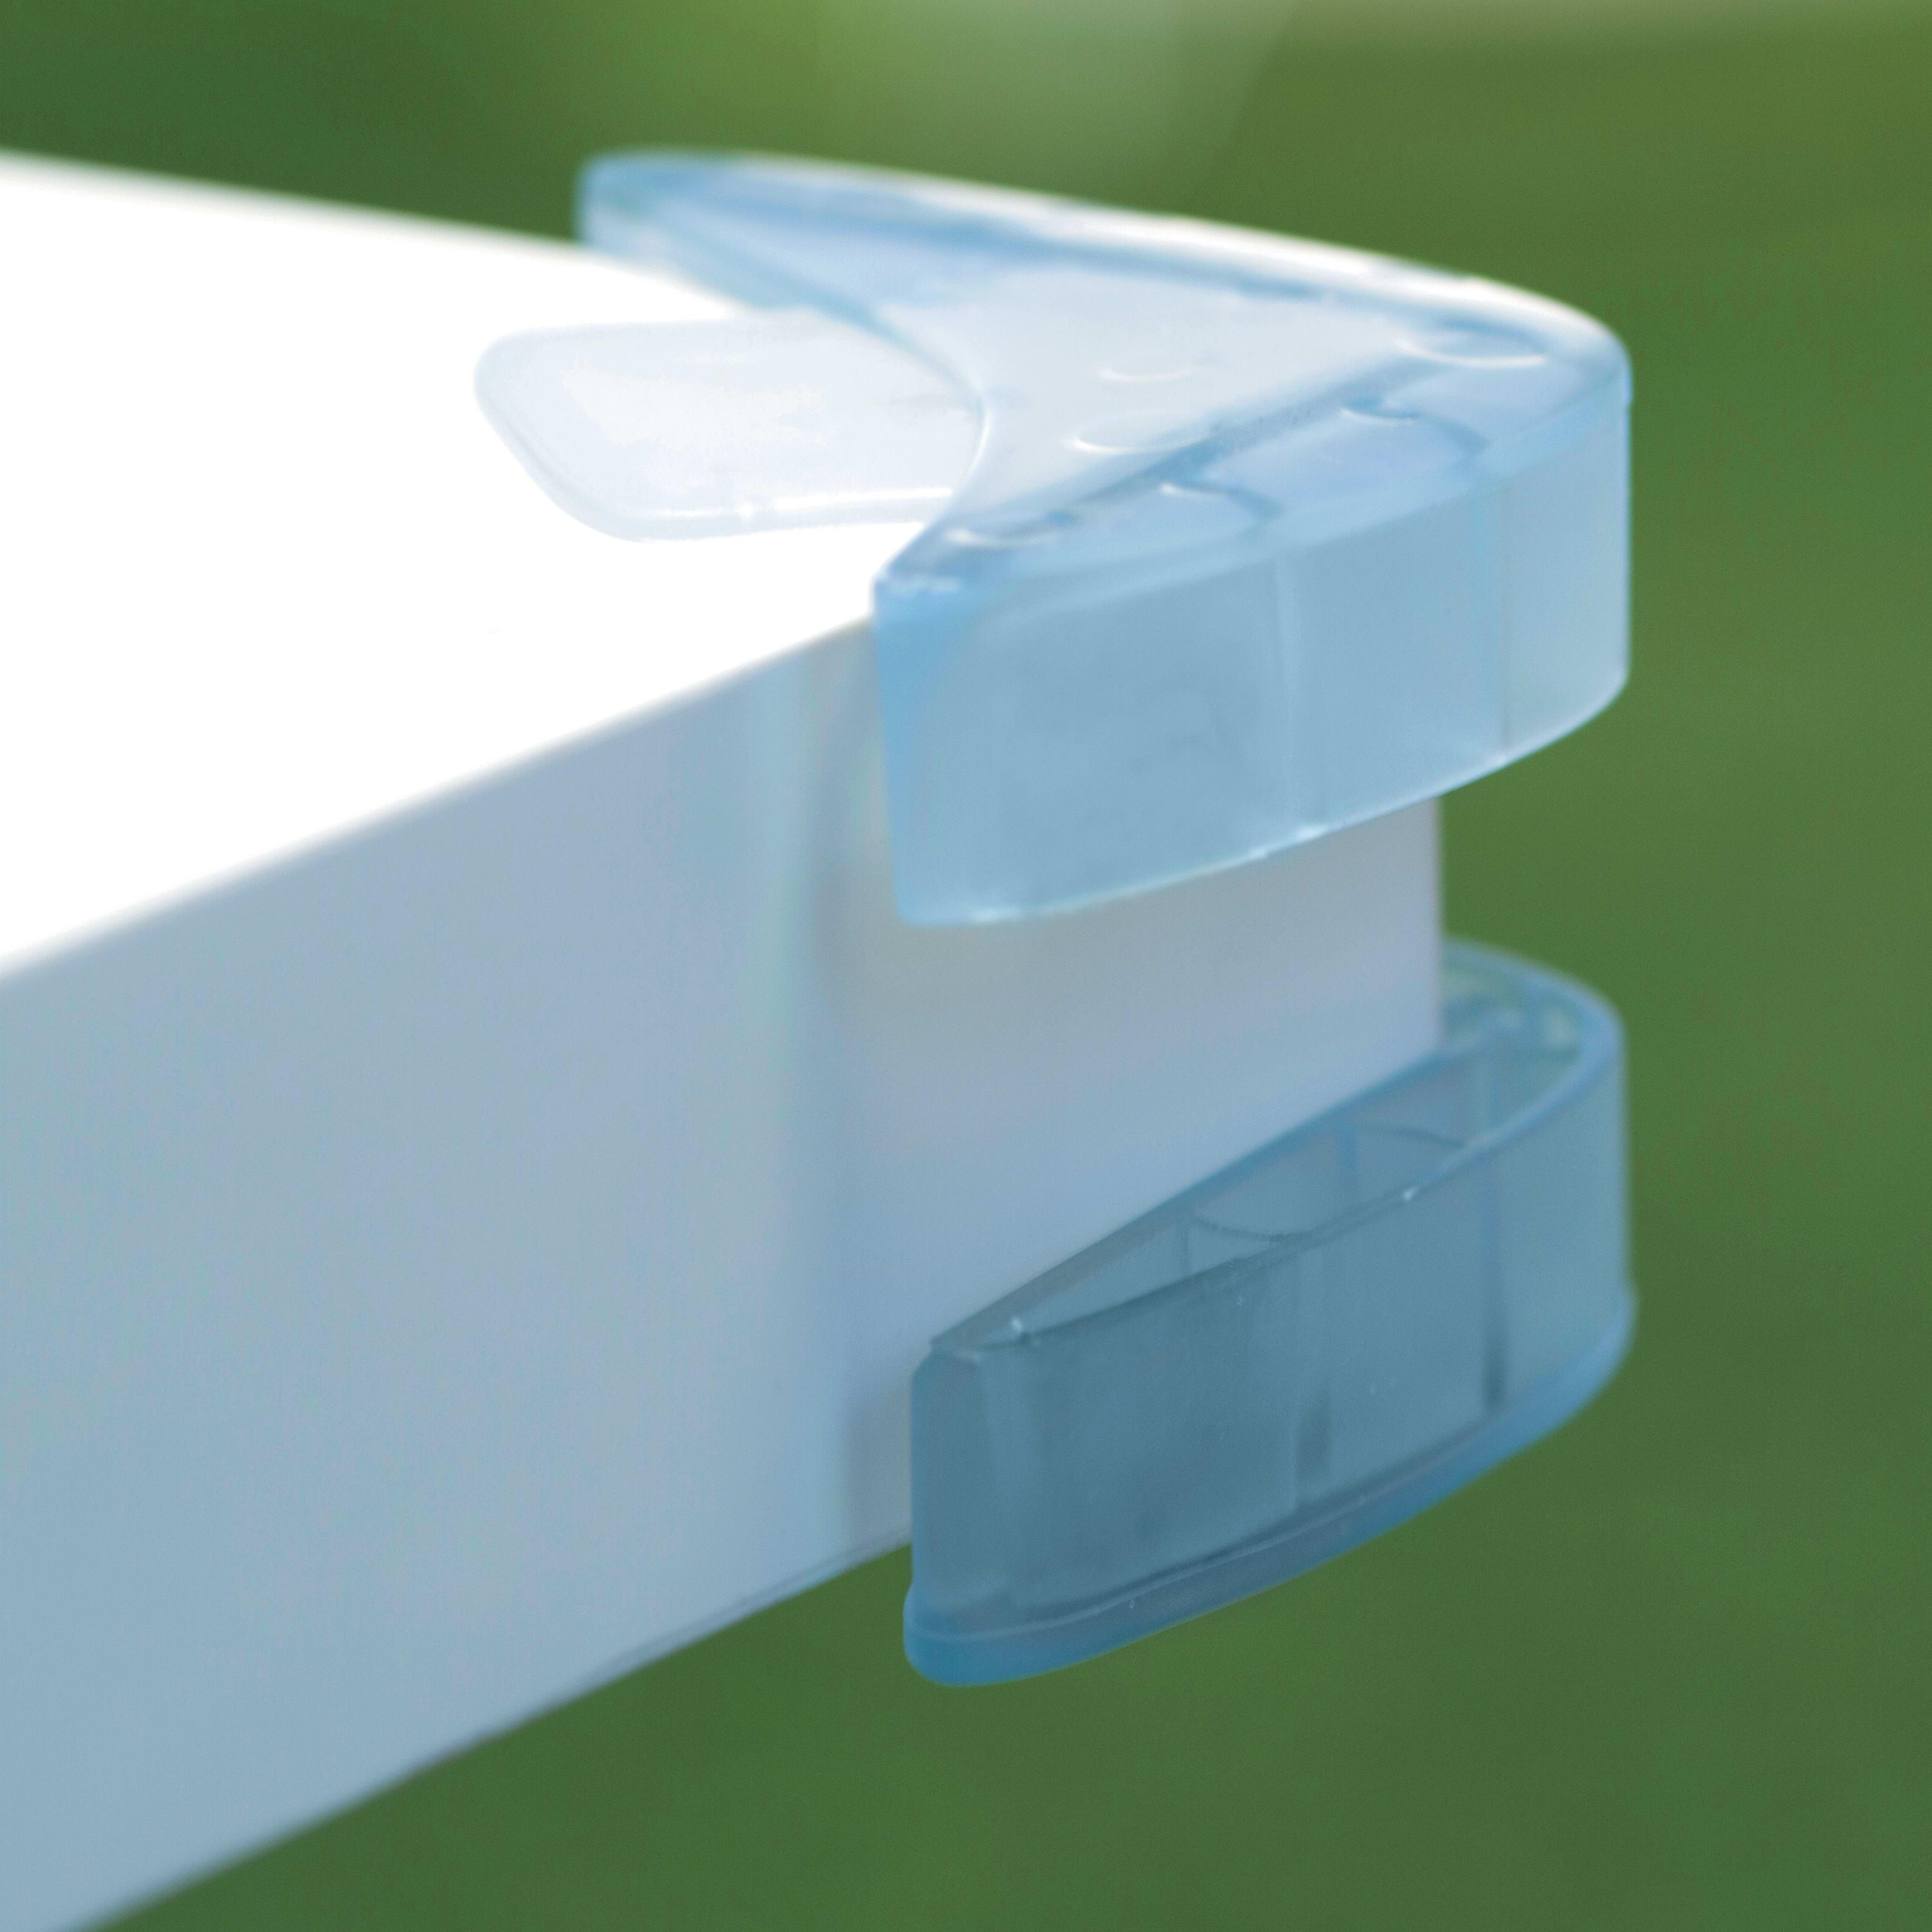 Furniture Child Protection Trasparente In Plastica Pvc Sp 30 Mm 4 Pezzi